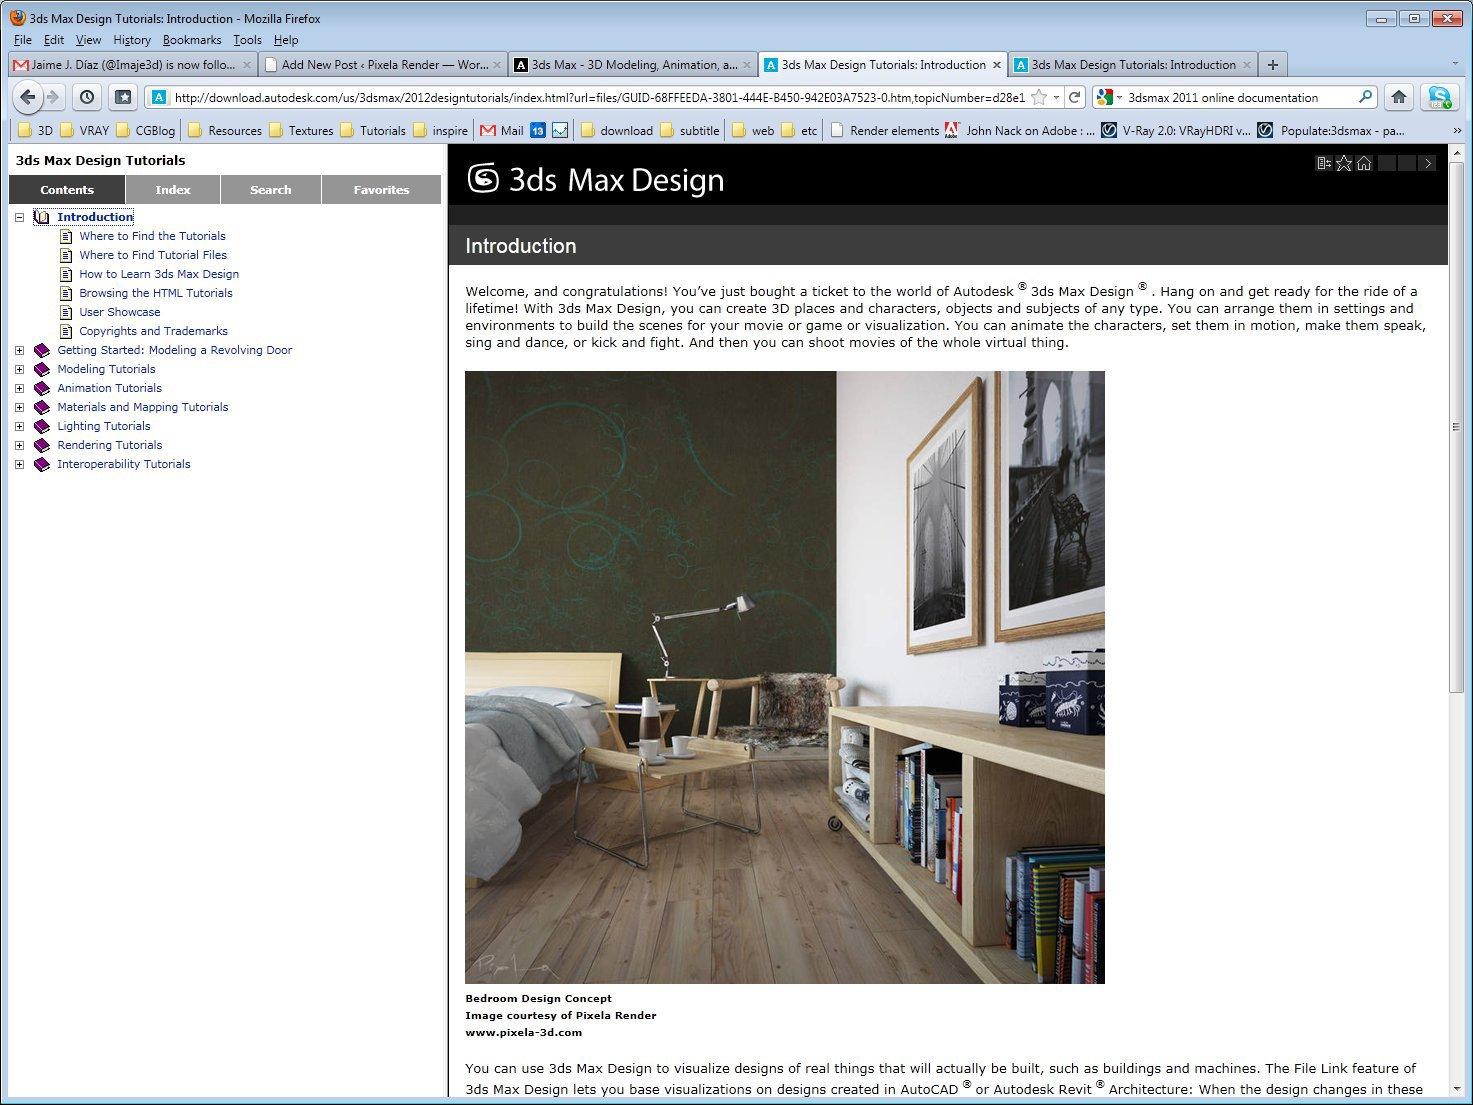 Autodesk 3DSMax 2012 Online Help Introduction